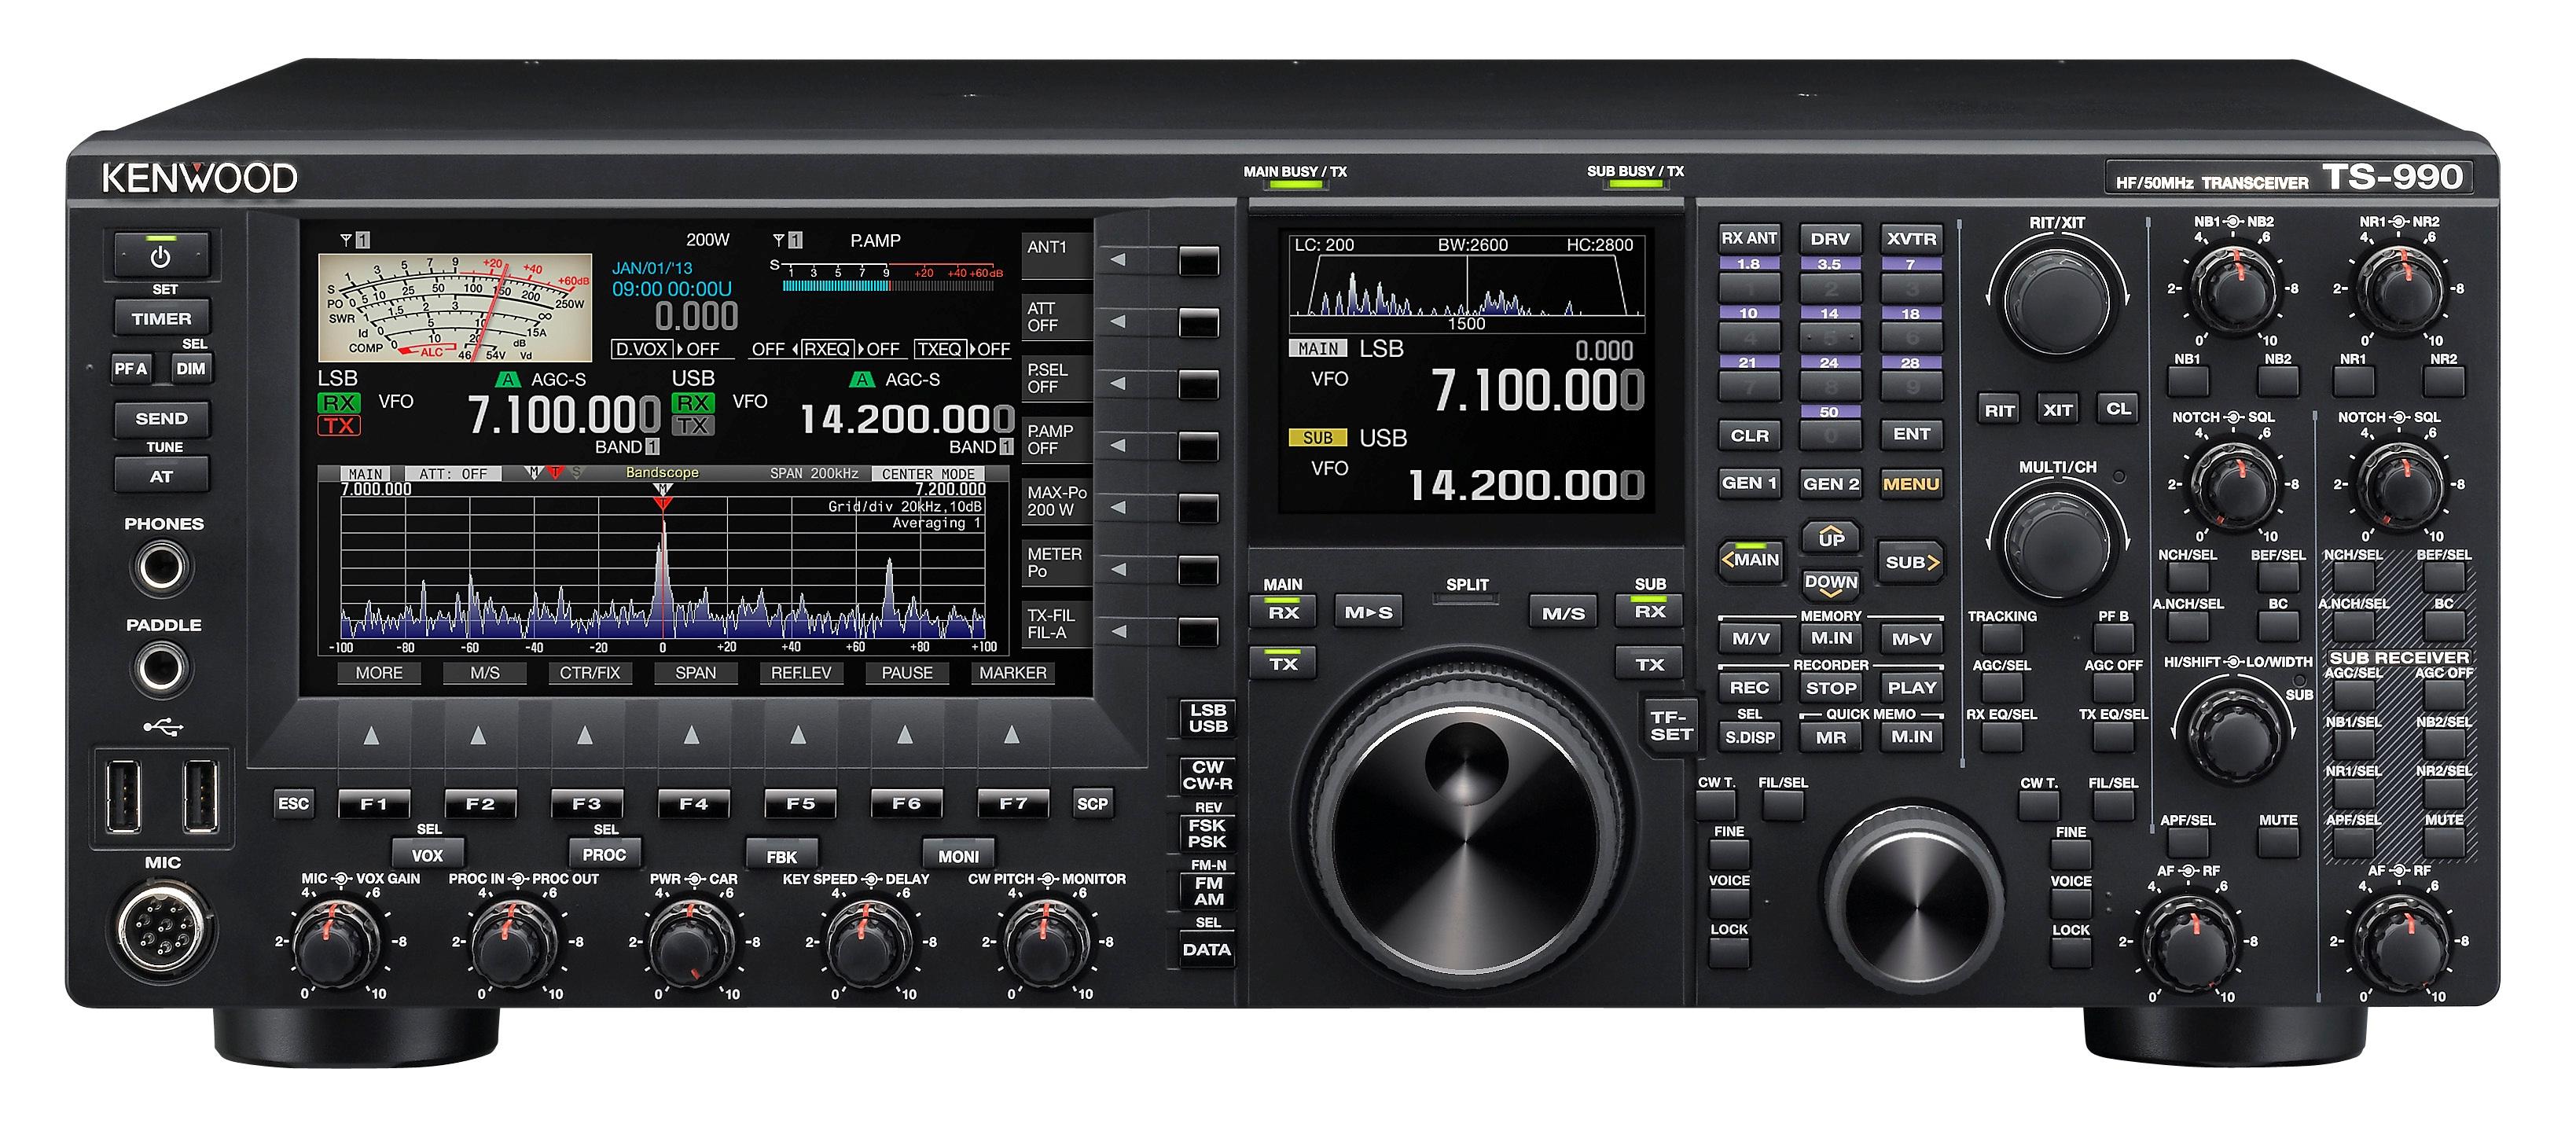 Radio Desktop Wallpaper For Pc on Best Hd Radios